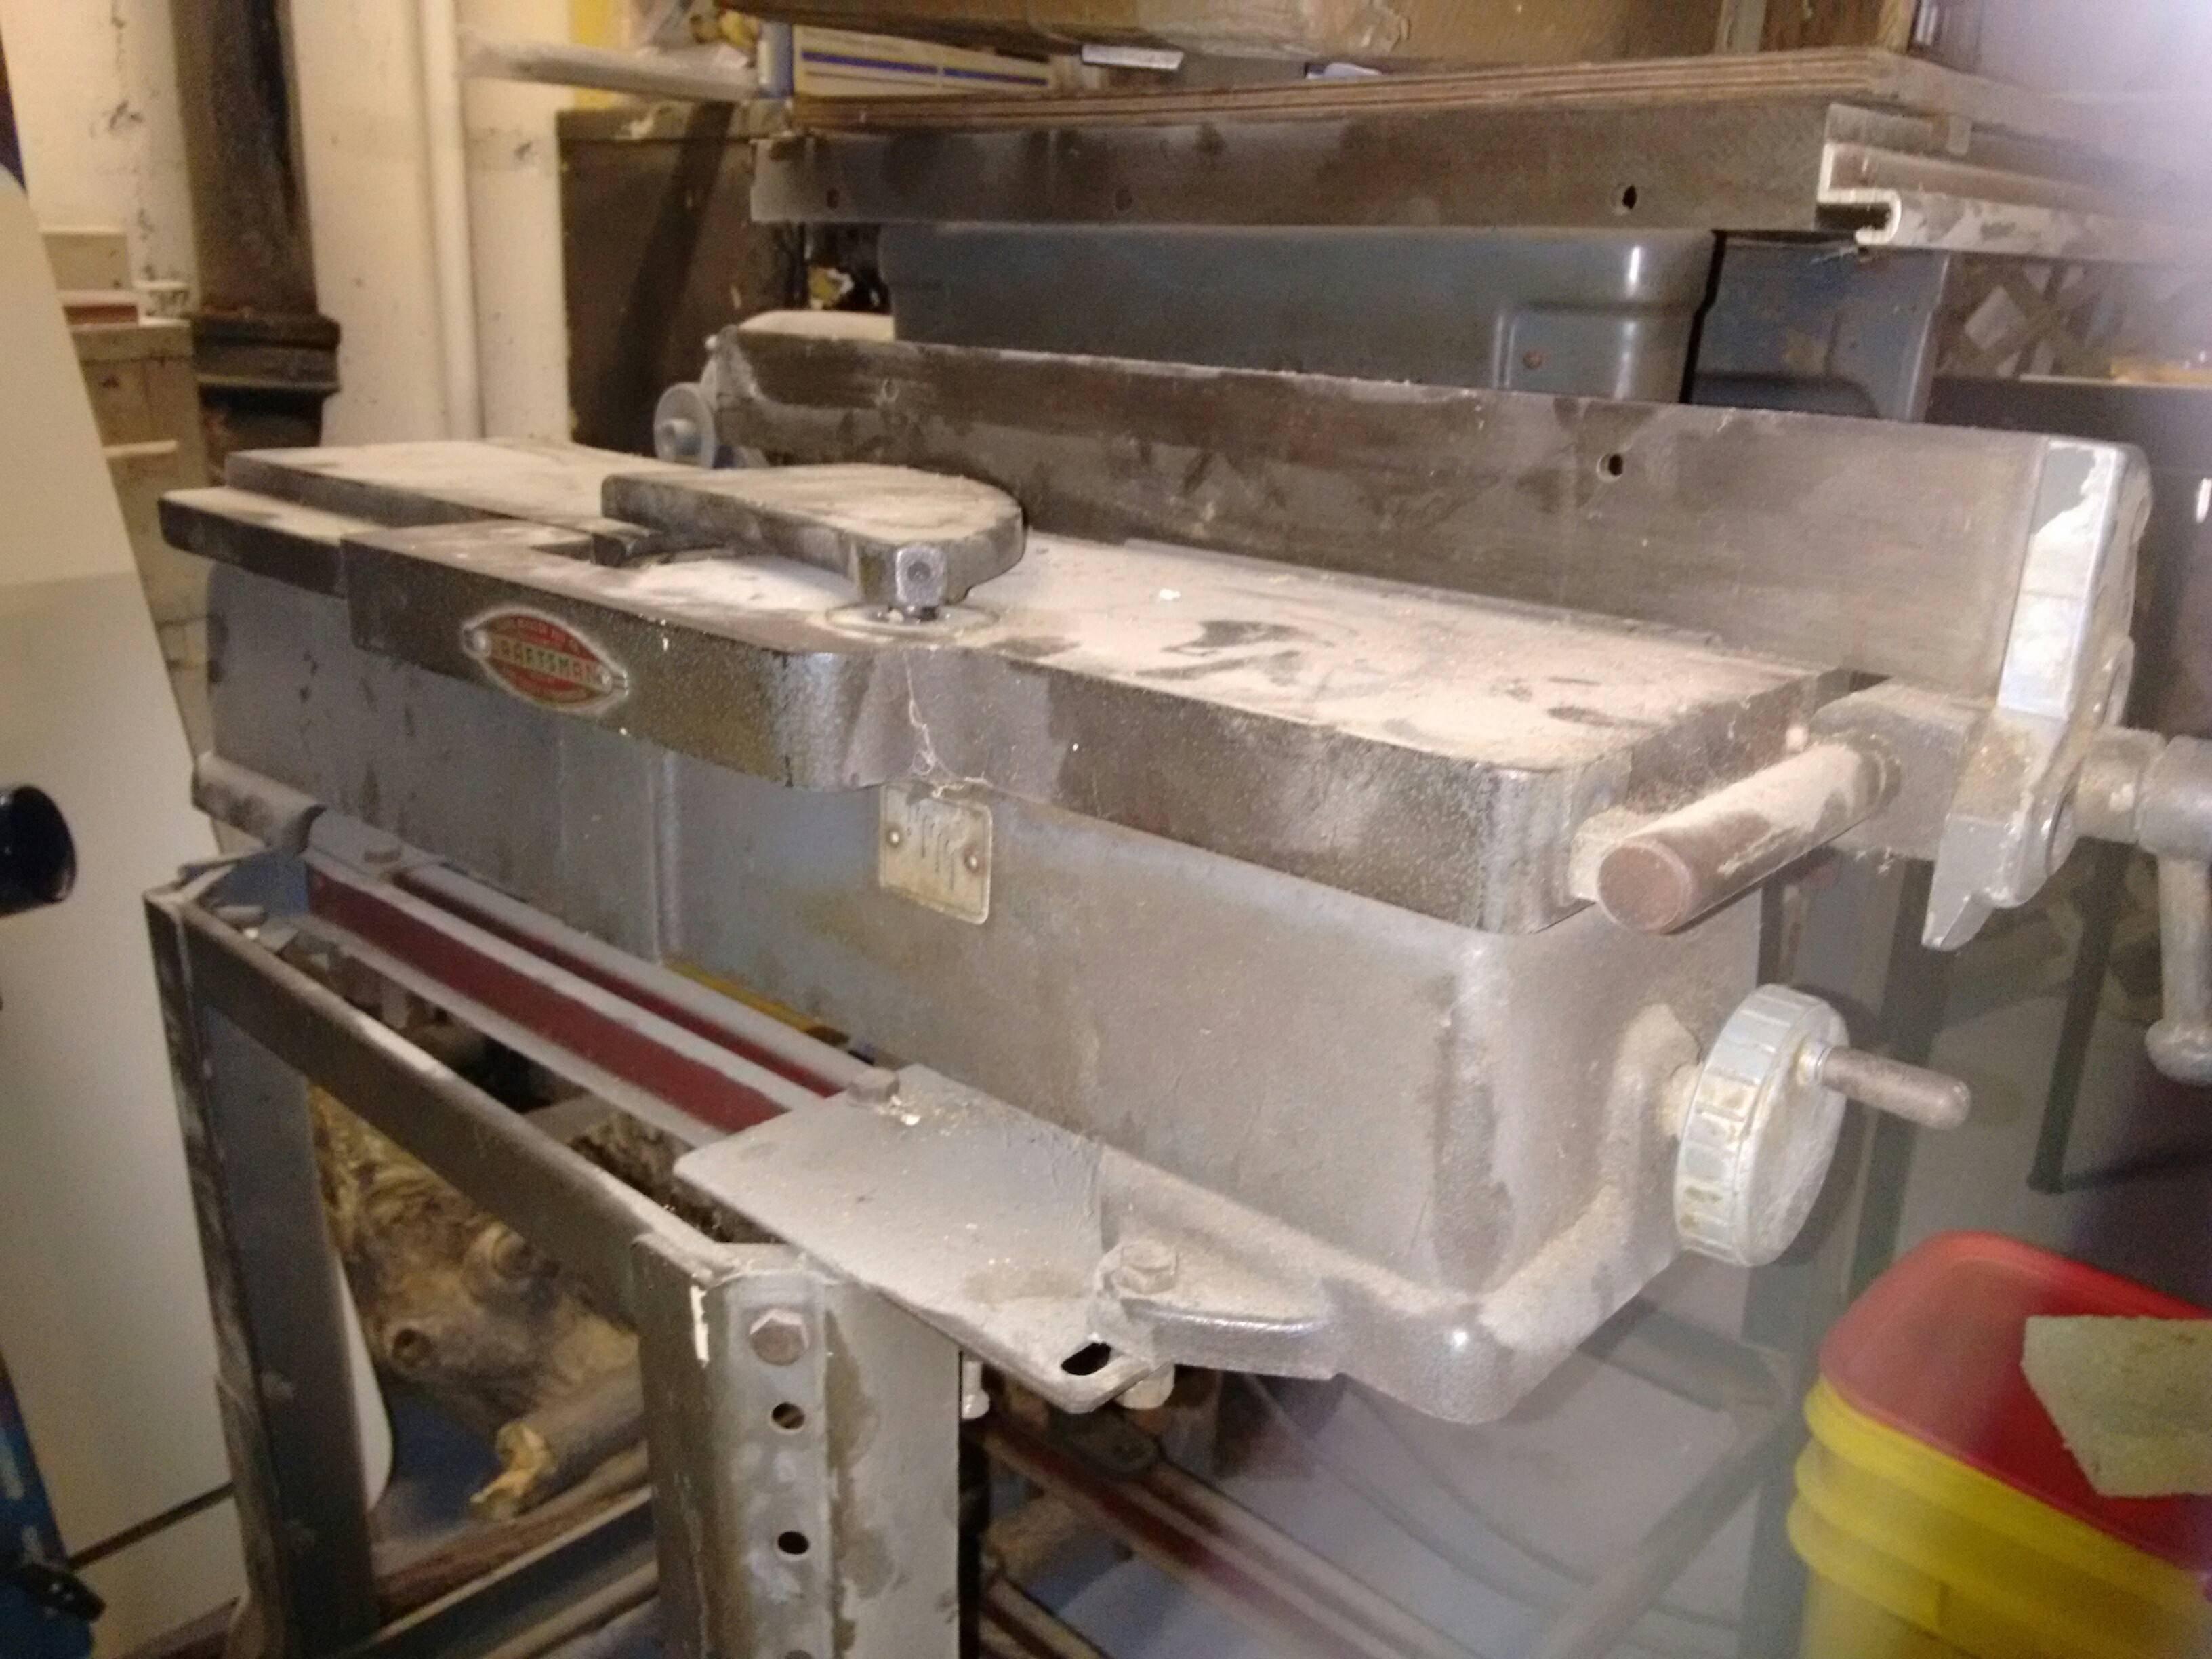 Craftsman bench jointer